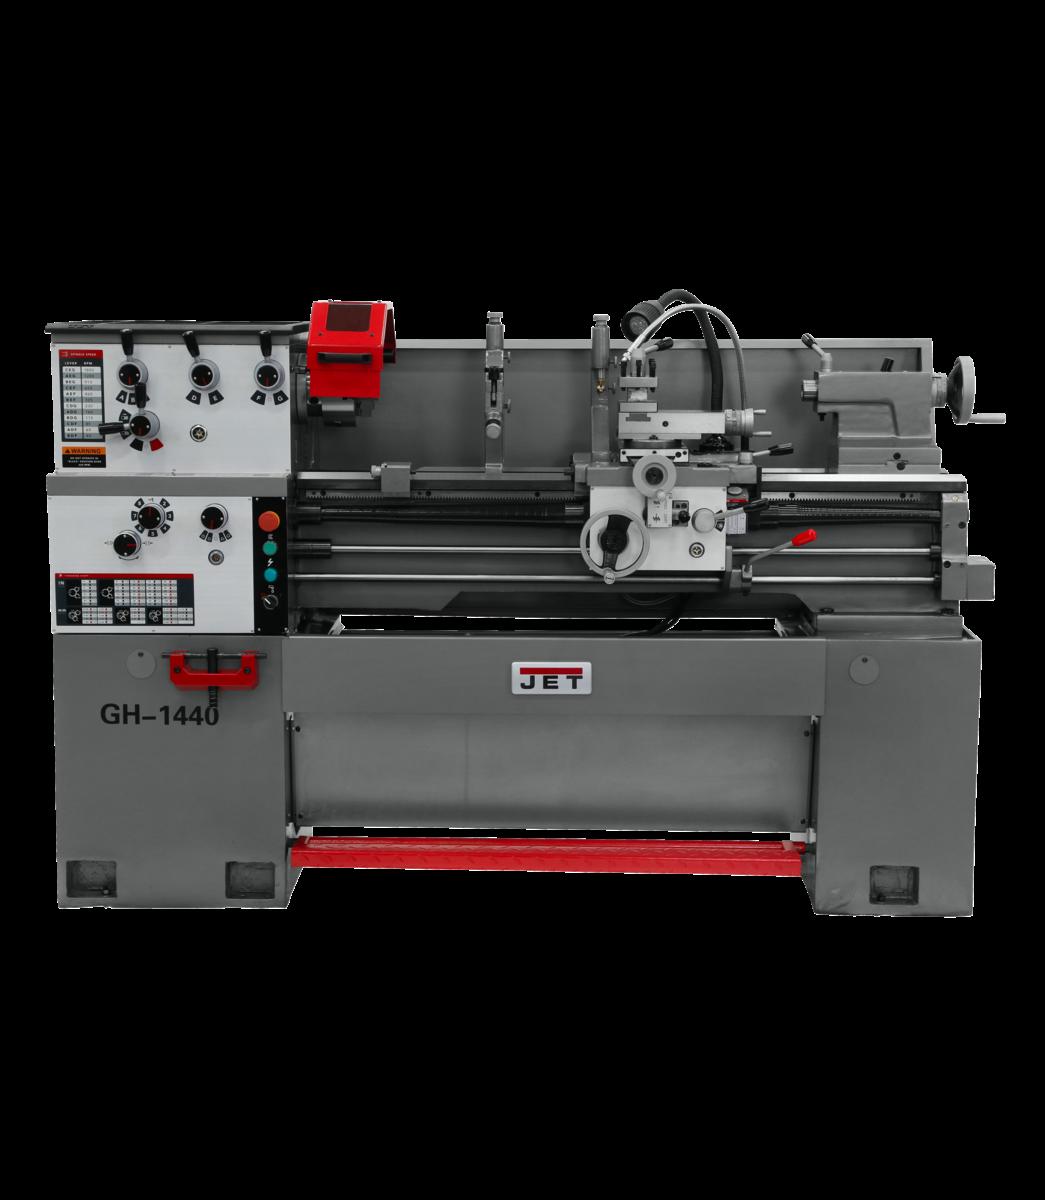 GH-1440-1 Lathe with Acu-Rite 203 DRO